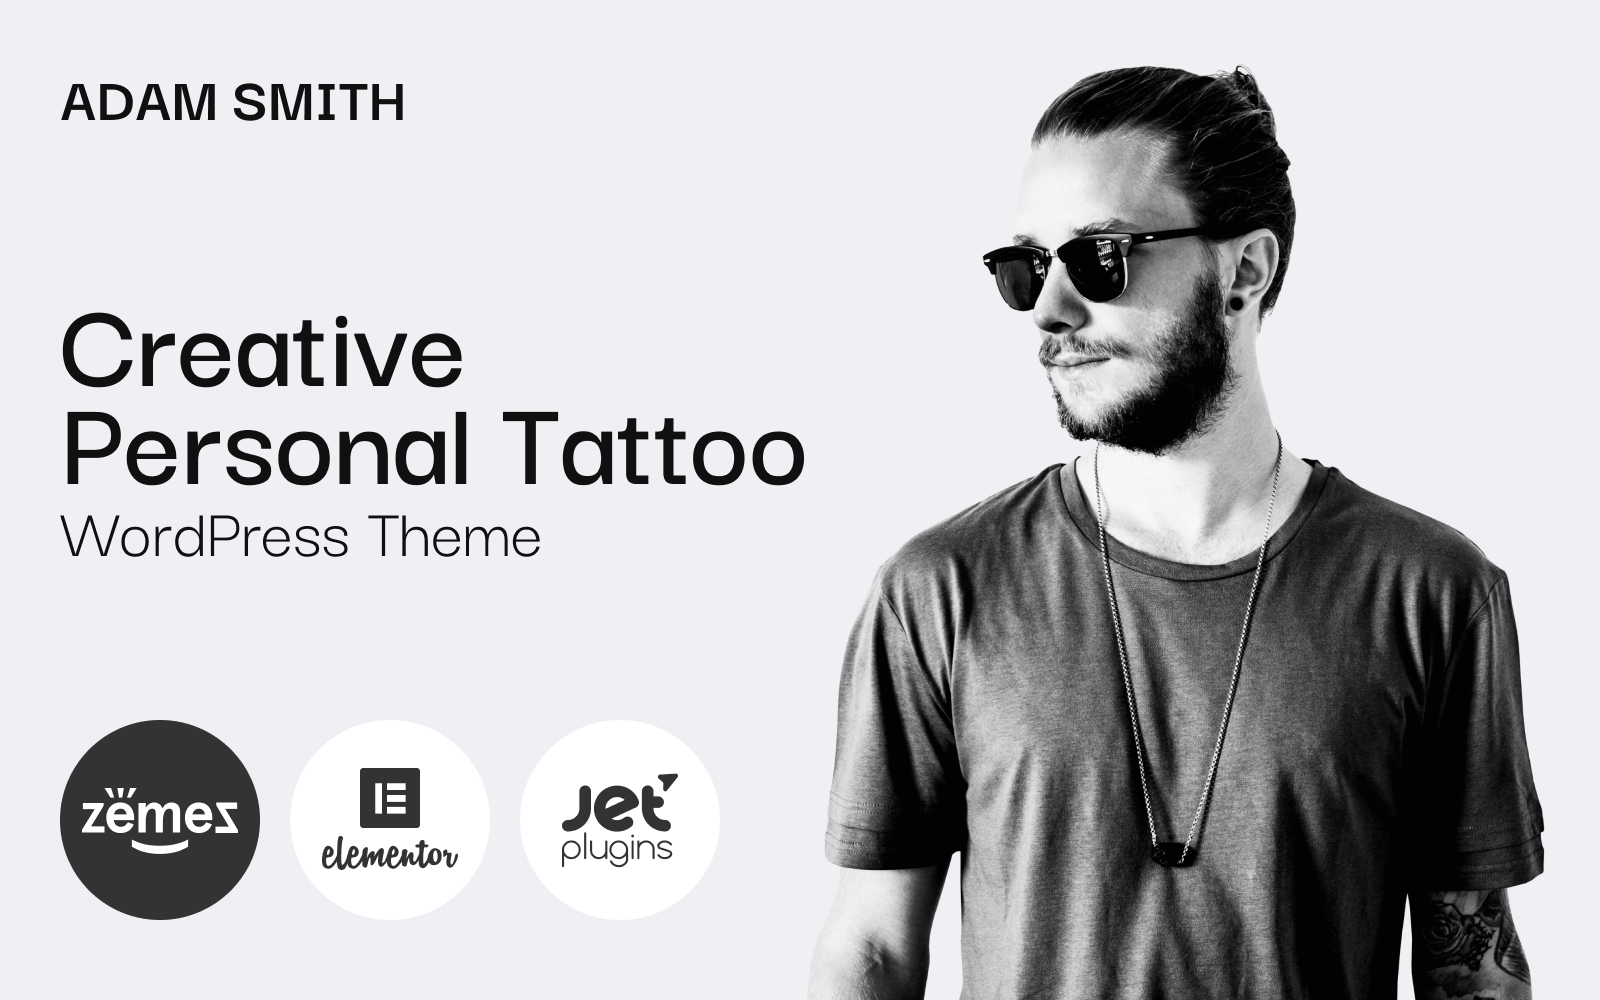 Adam Smith - Creative Personal Tattoo Pro WordPress Theme